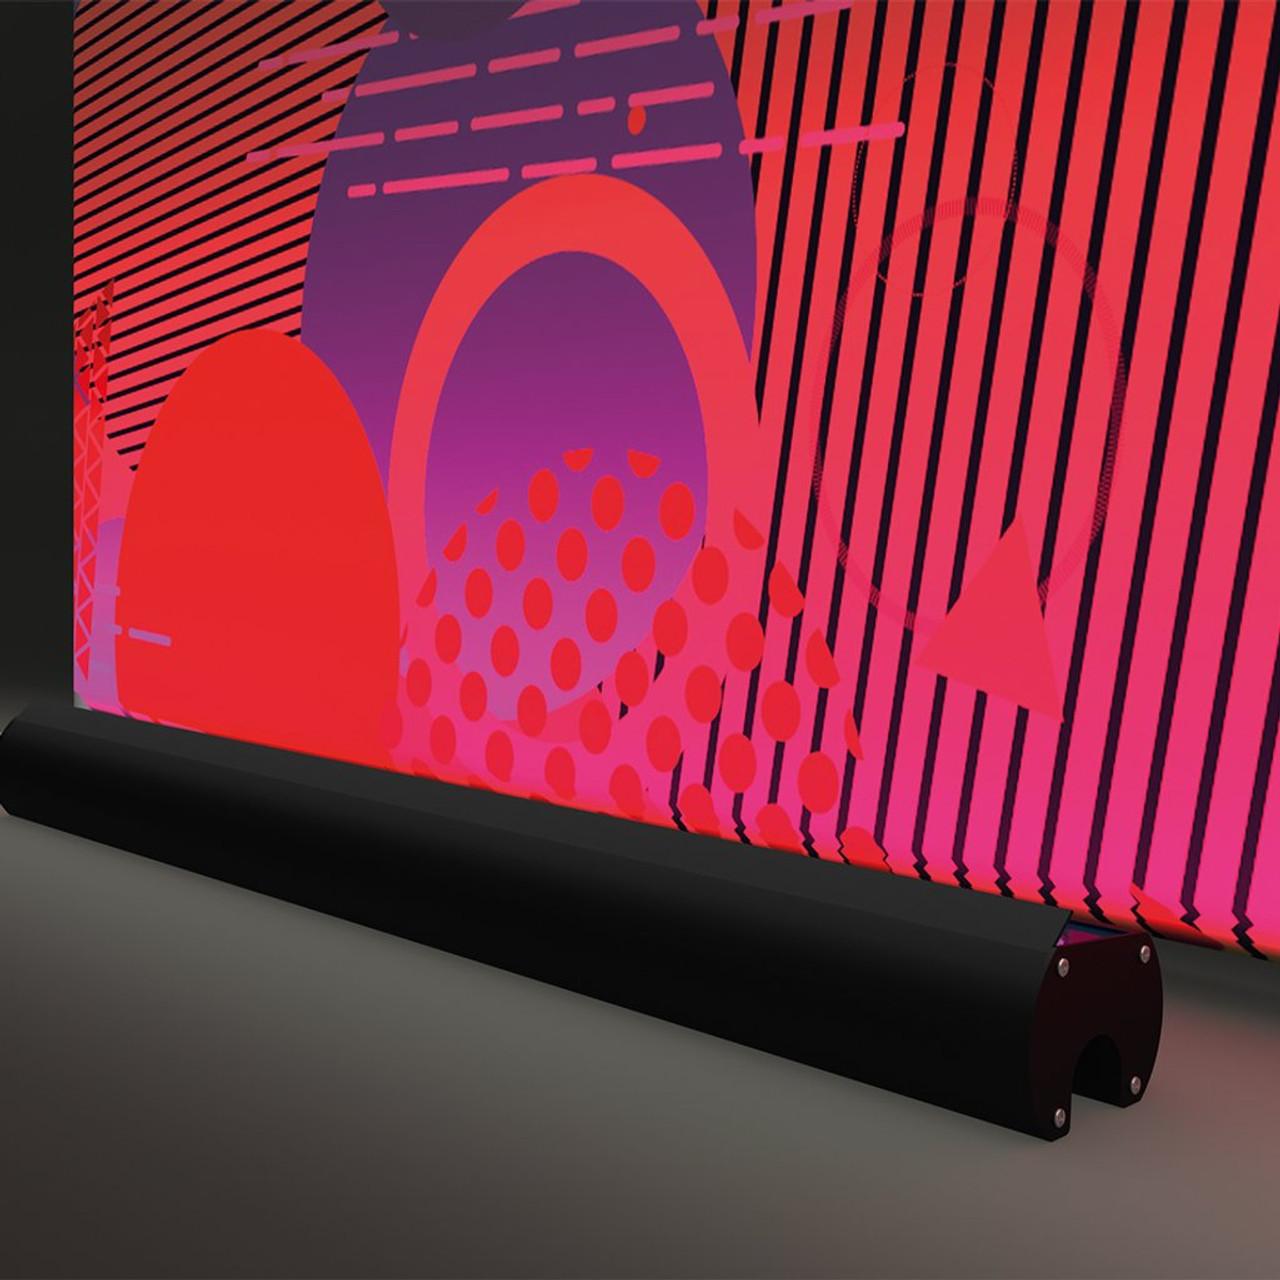 Aurascape led rgb light bar best tradeshow display aurascape led rgb light bar aloadofball Images